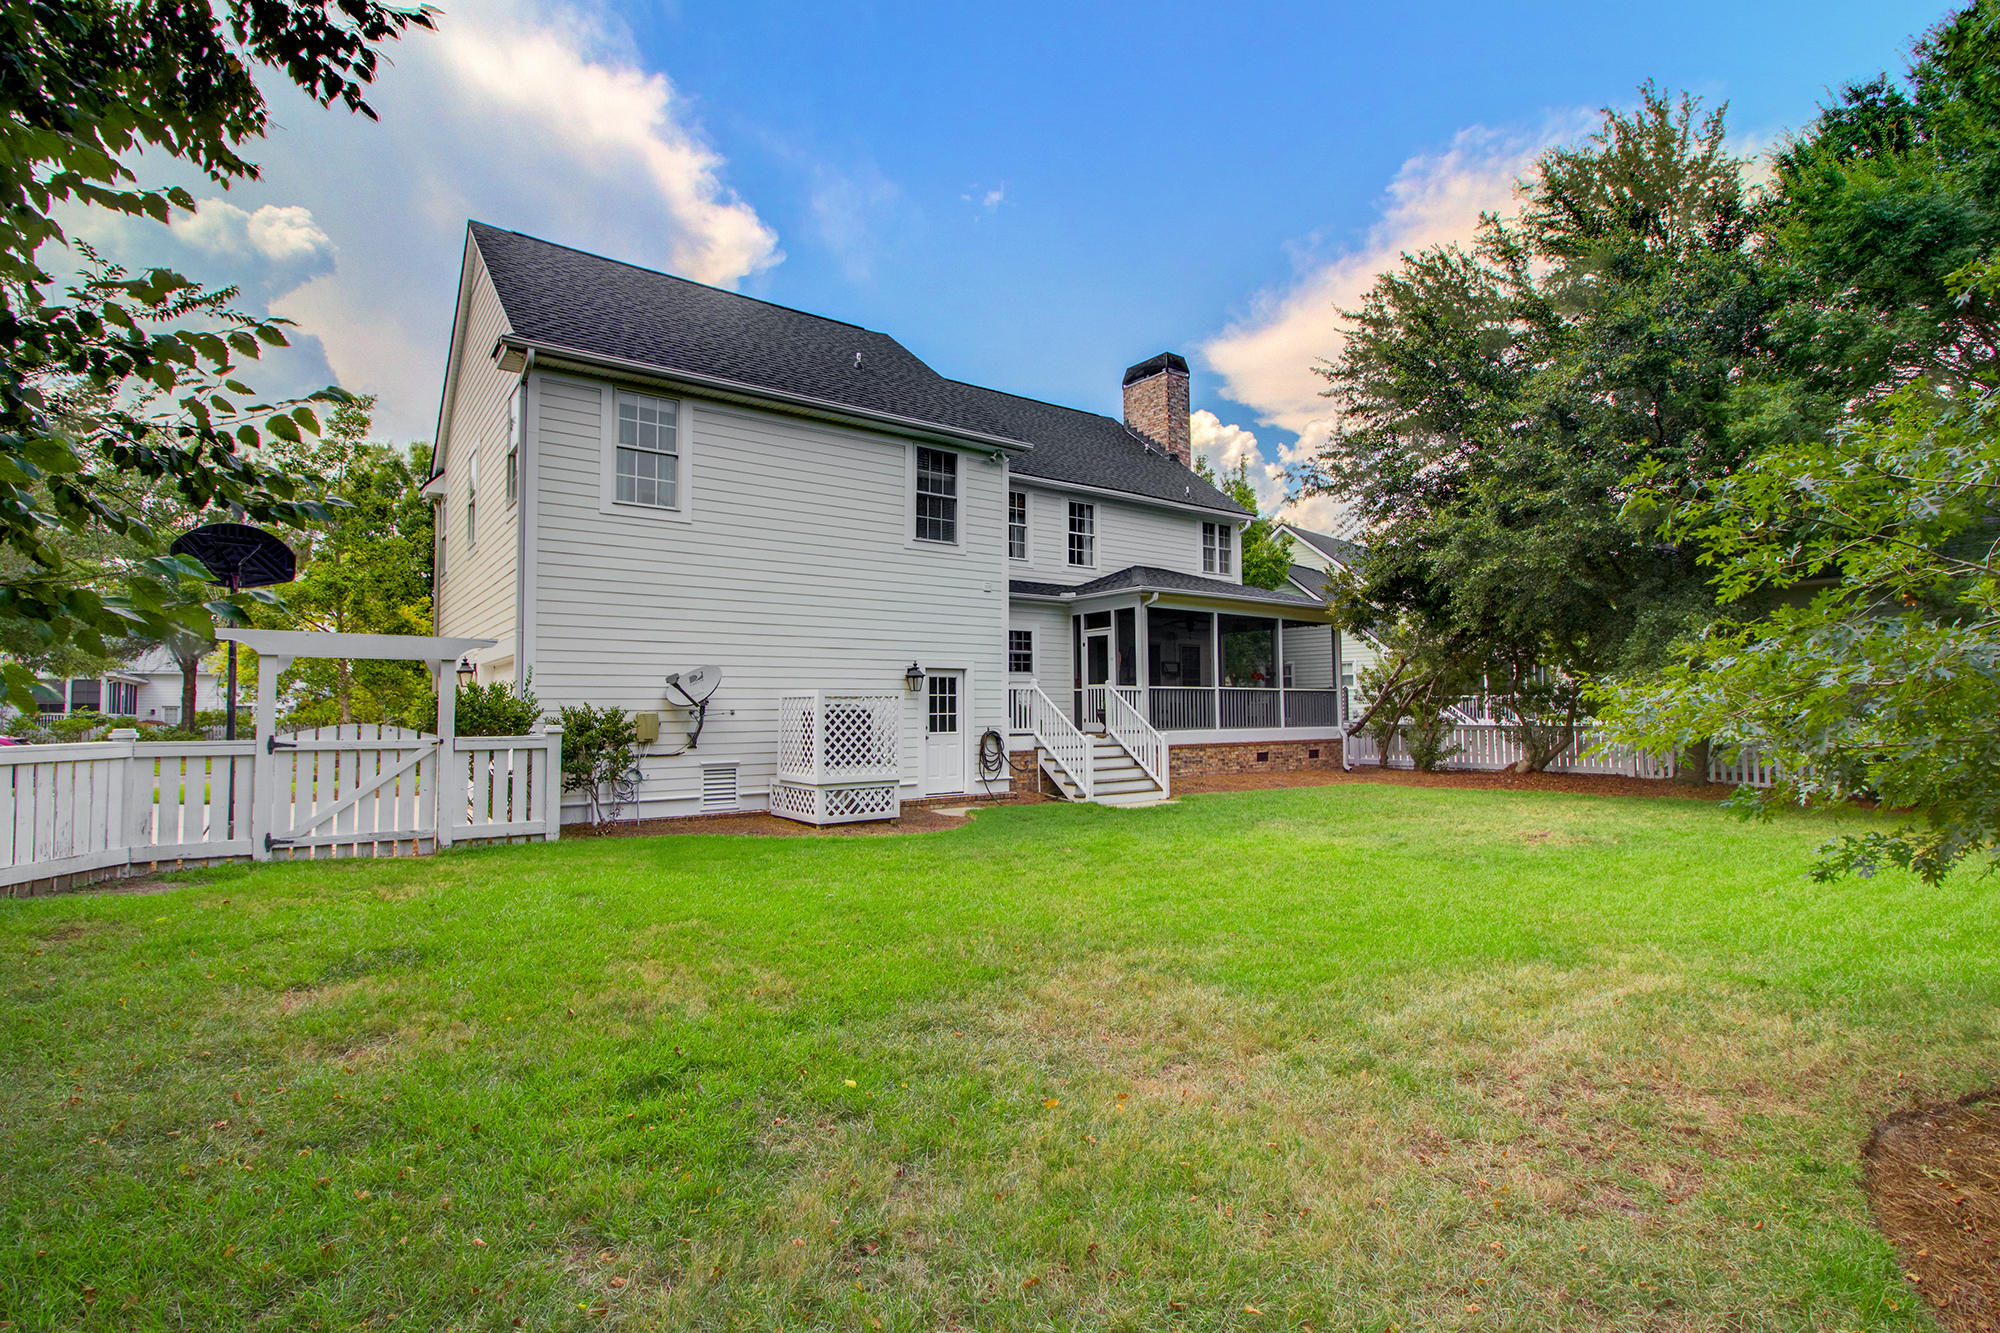 Codners Ferry Park Homes For Sale - 227 Fairchild, Daniel Island, SC - 4